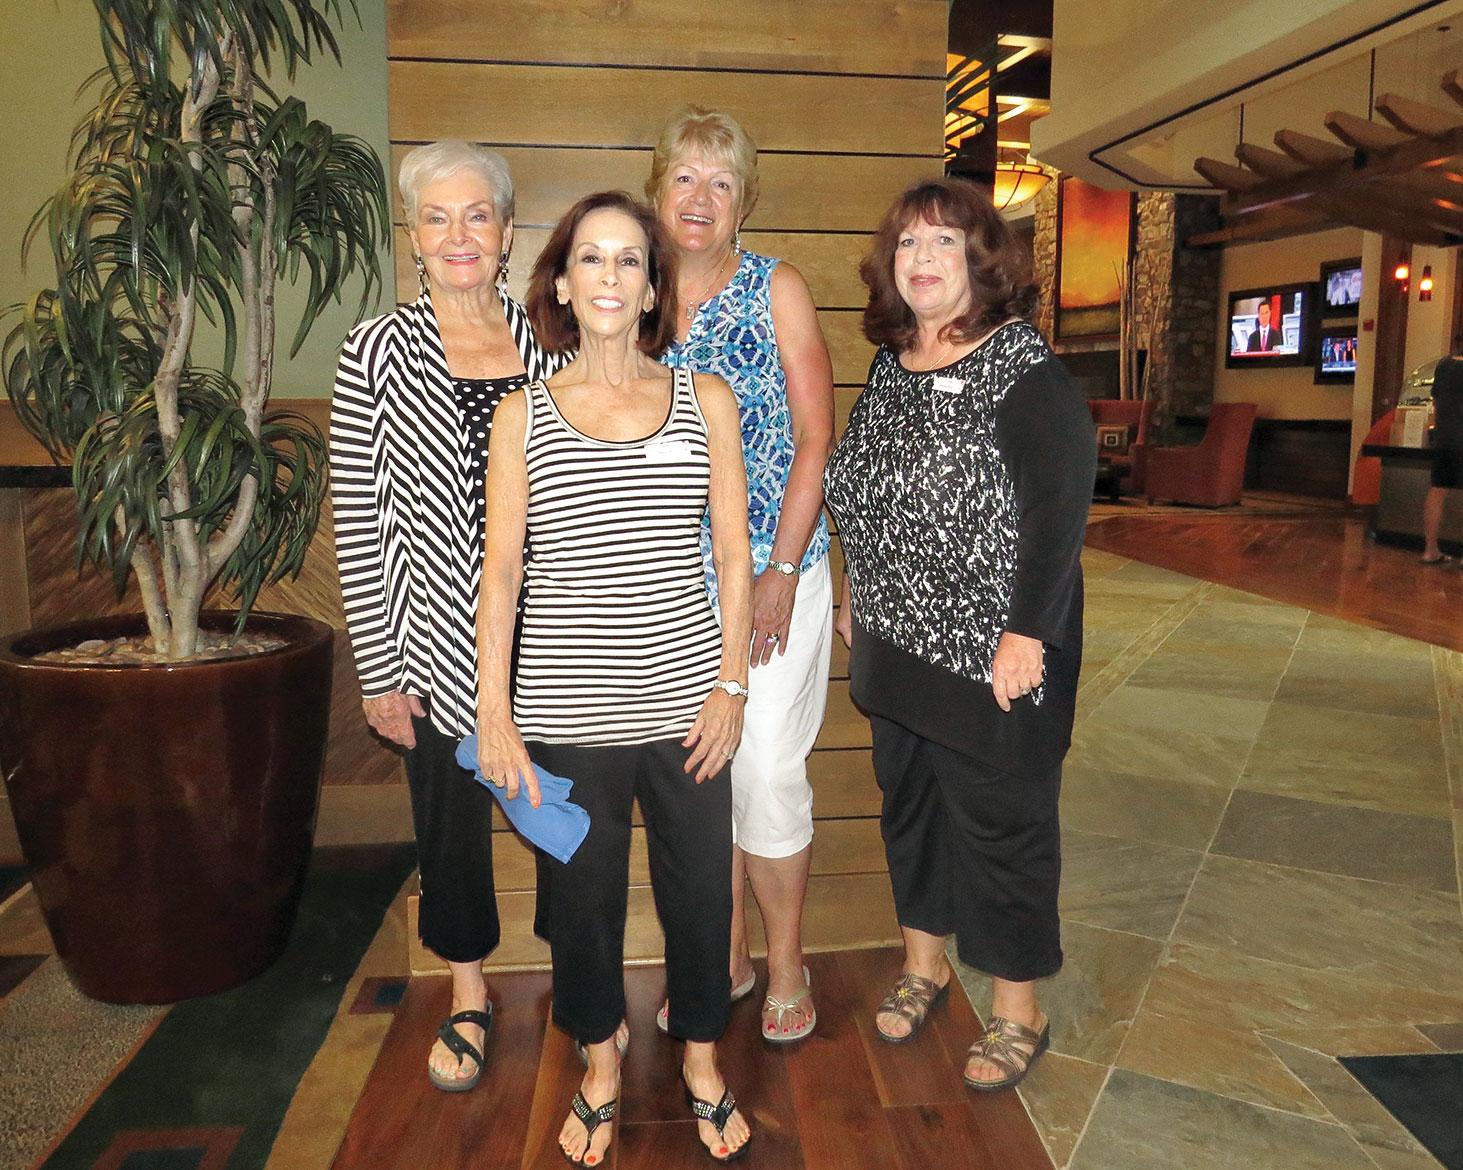 Back row: Pat Hartgrove, Carolyn Blake, Karen Rasmussen; front row: Beth Berzon